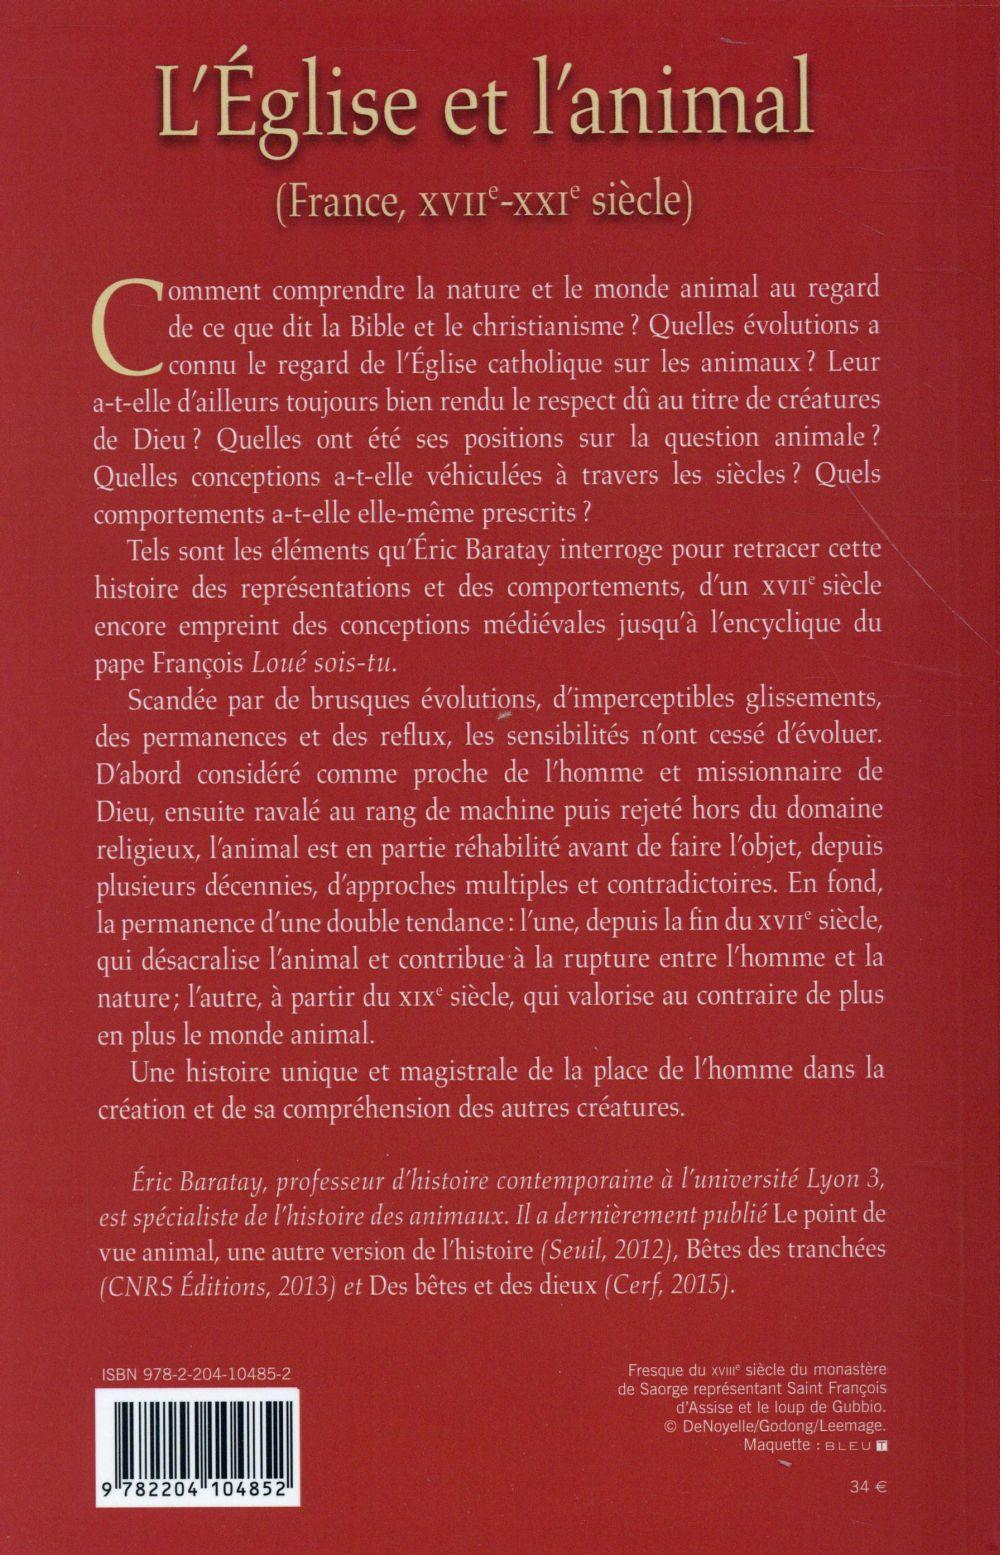 L'Eglise et l'animal (France, XVIIe-XXIe siècle)